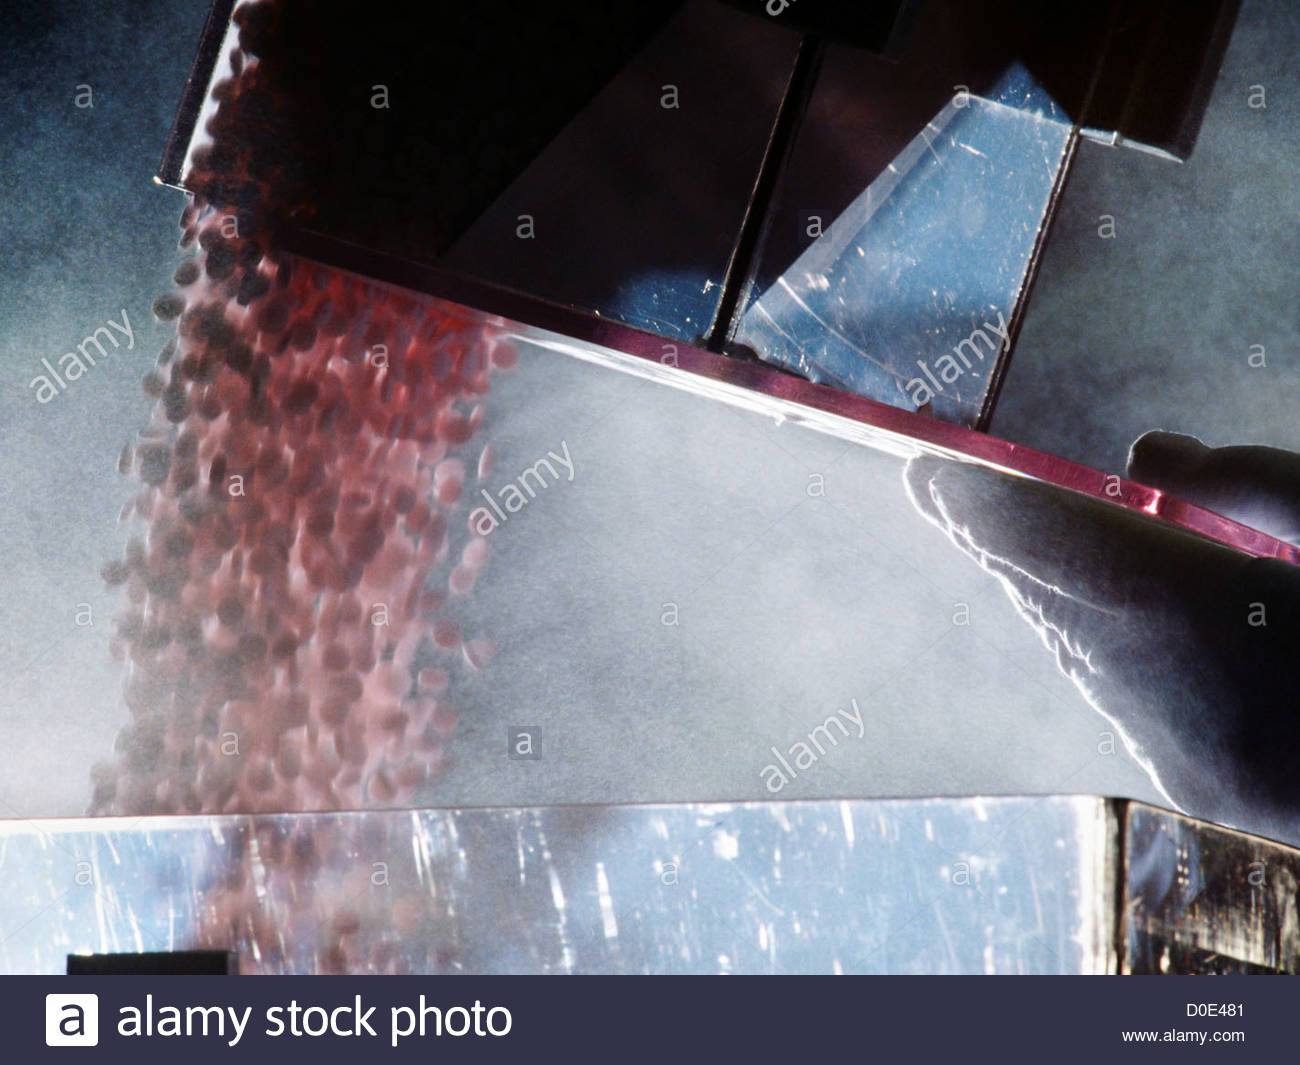 Mass Production Of Aspirin - Stock Image